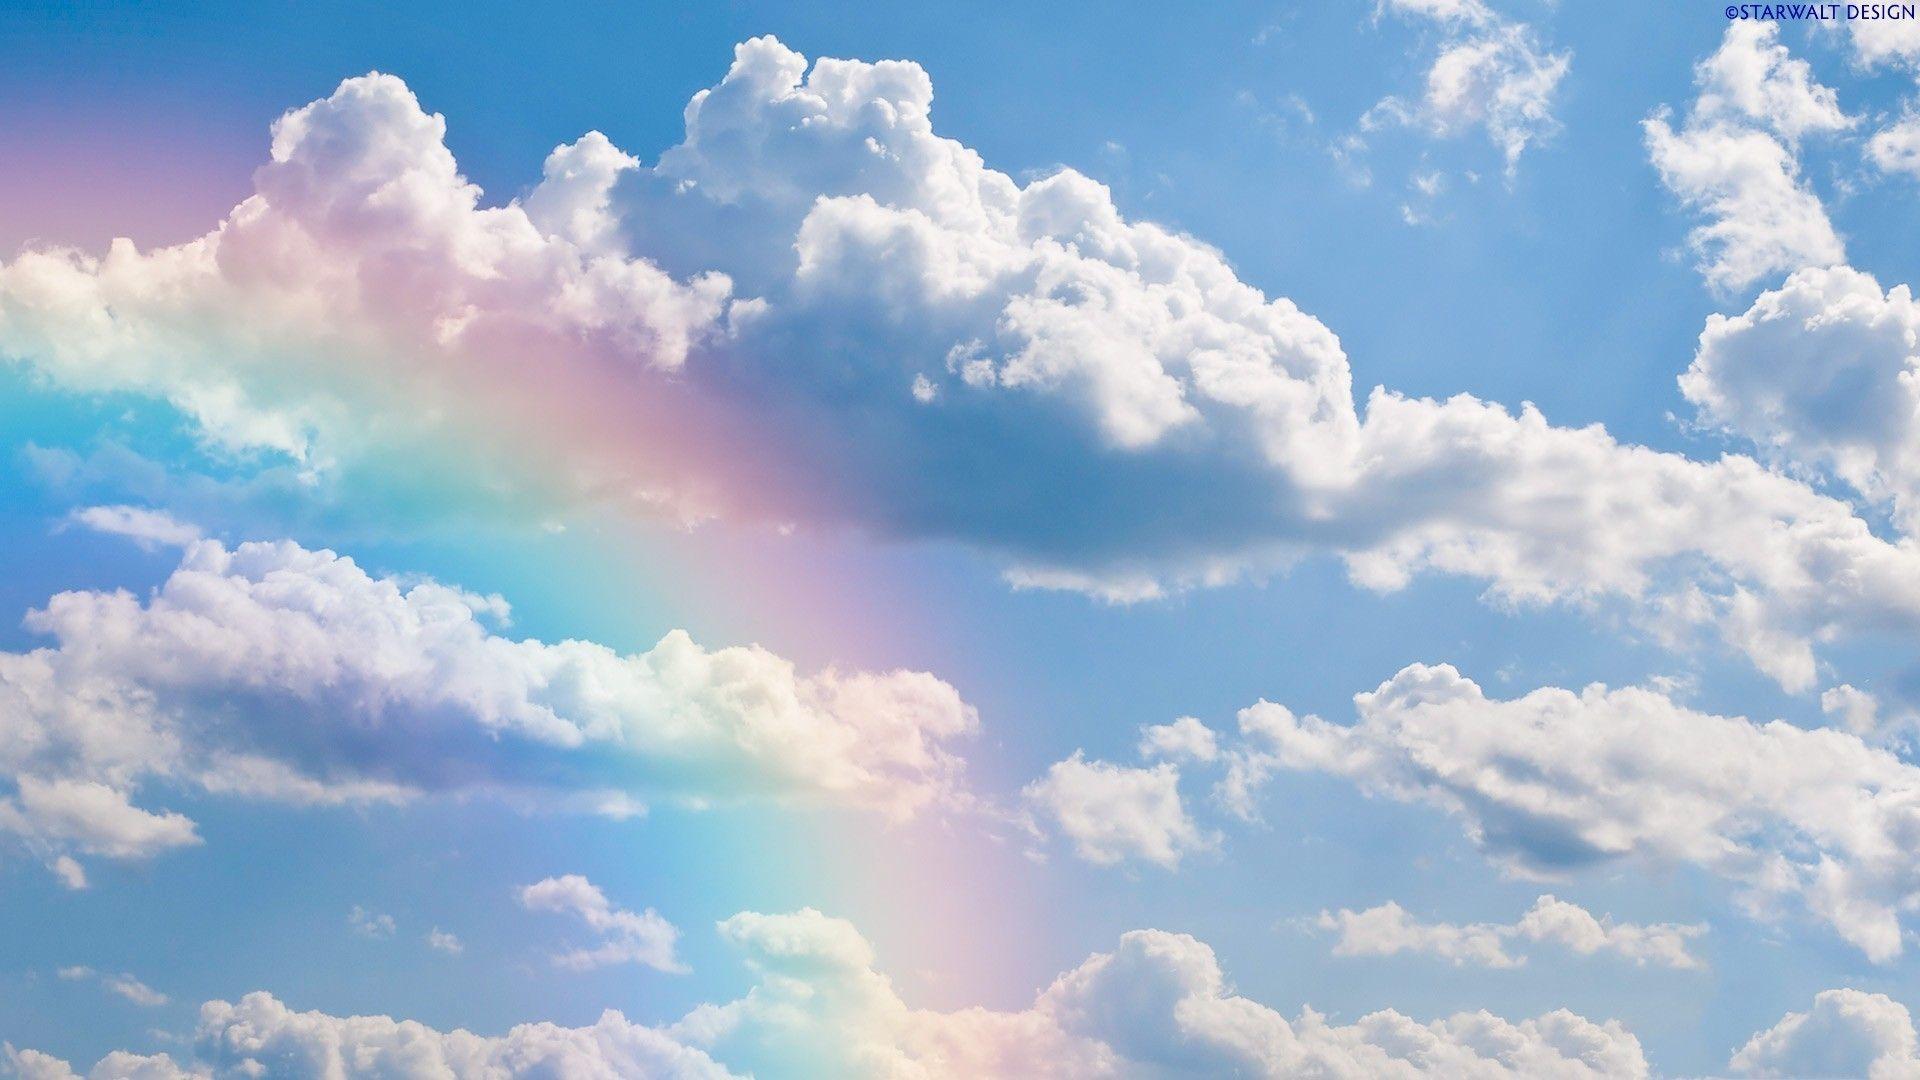 View 22 Sky Wallpaper Hd 1080P Download - probaco